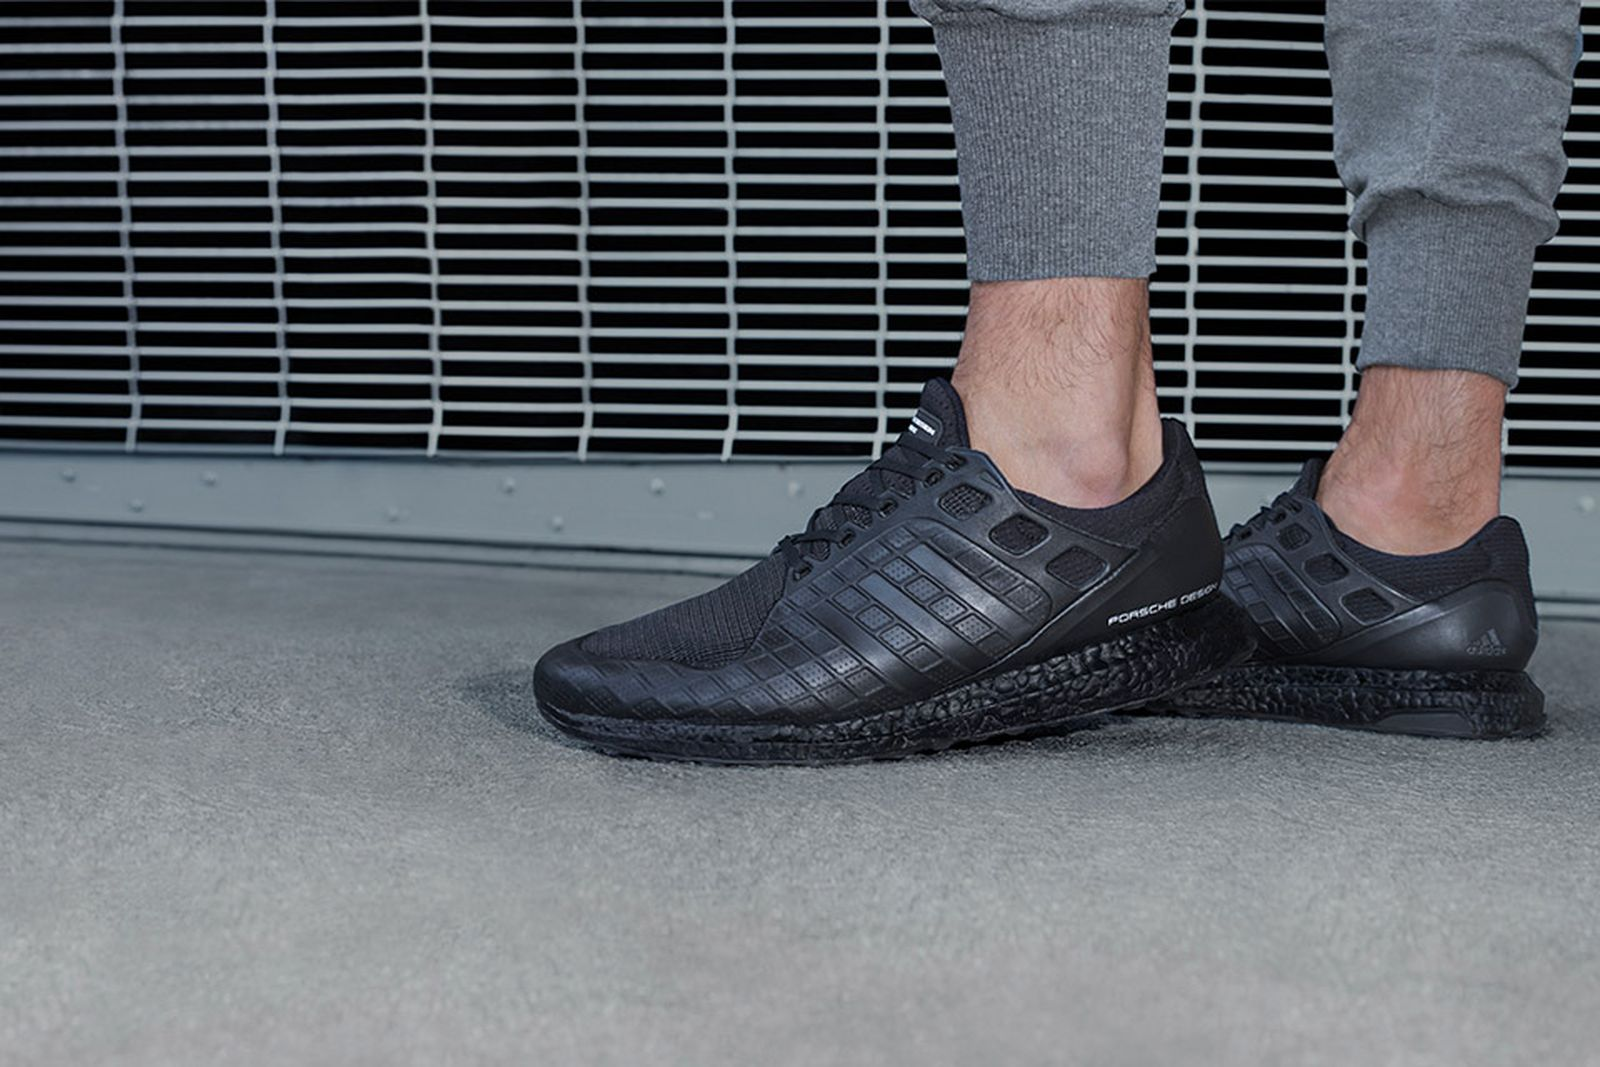 porsche-design-sport-adidas-ultra-boost-black-06